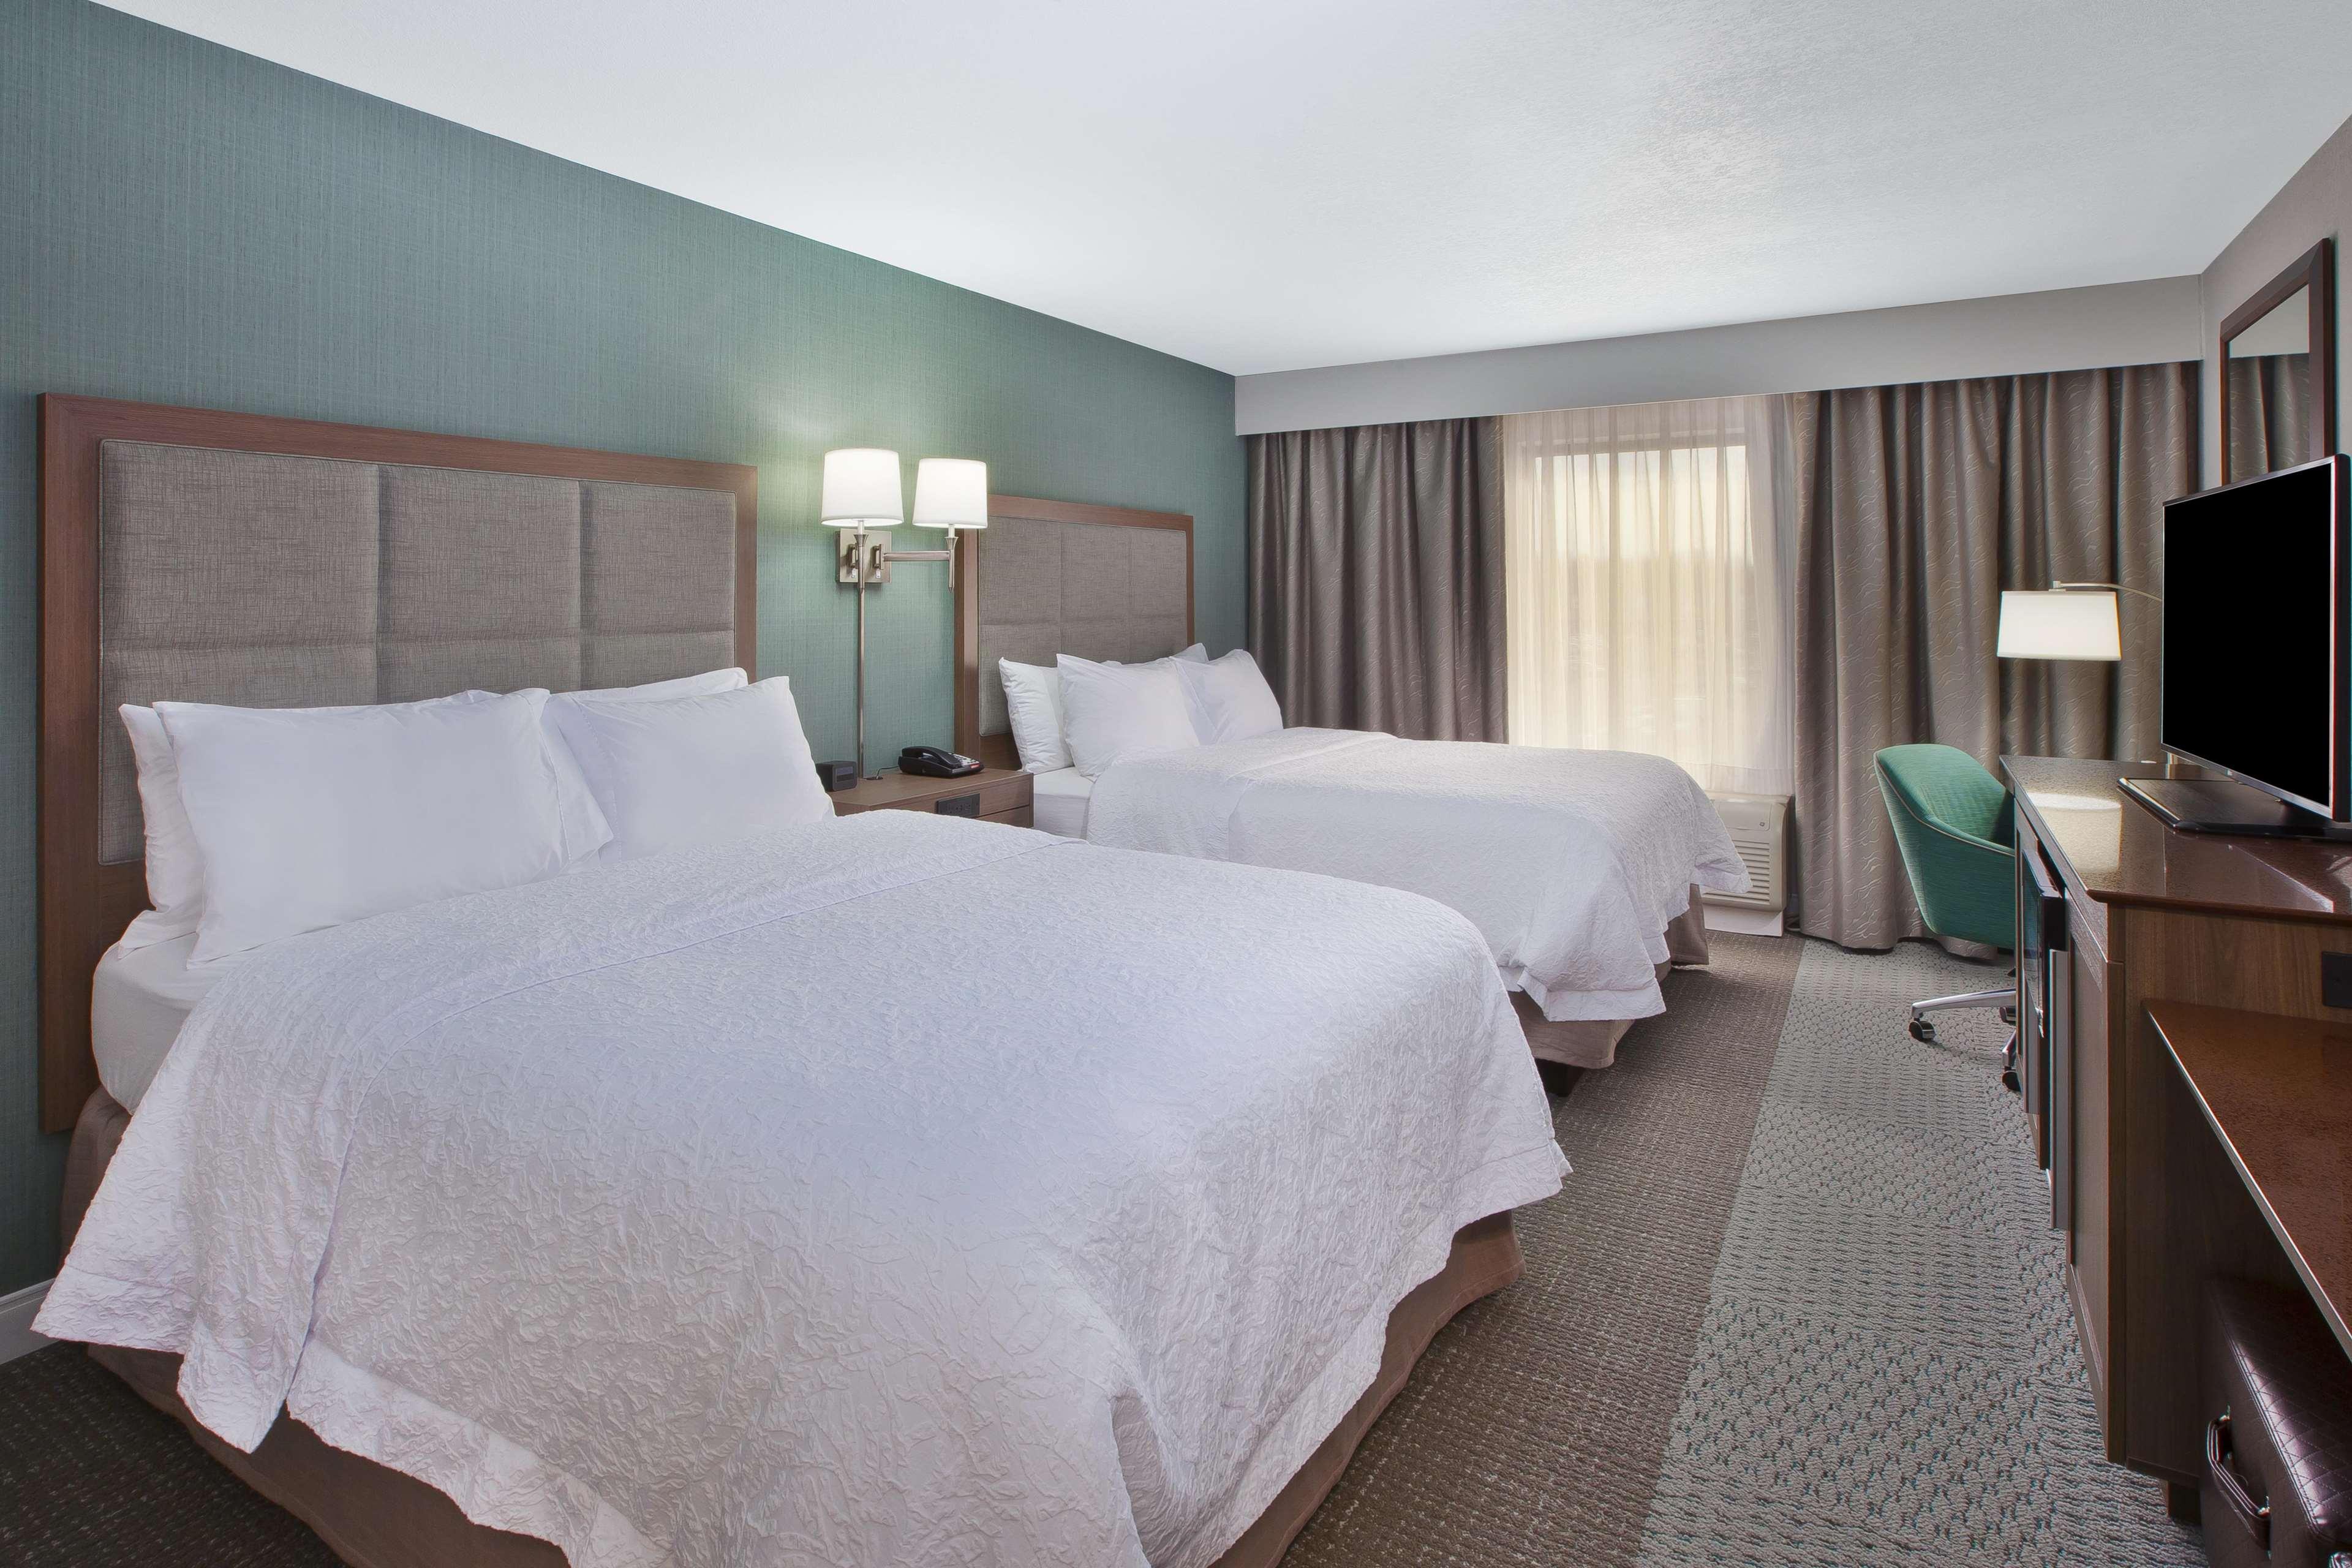 Hampton Inn & Suites Alliance image 14